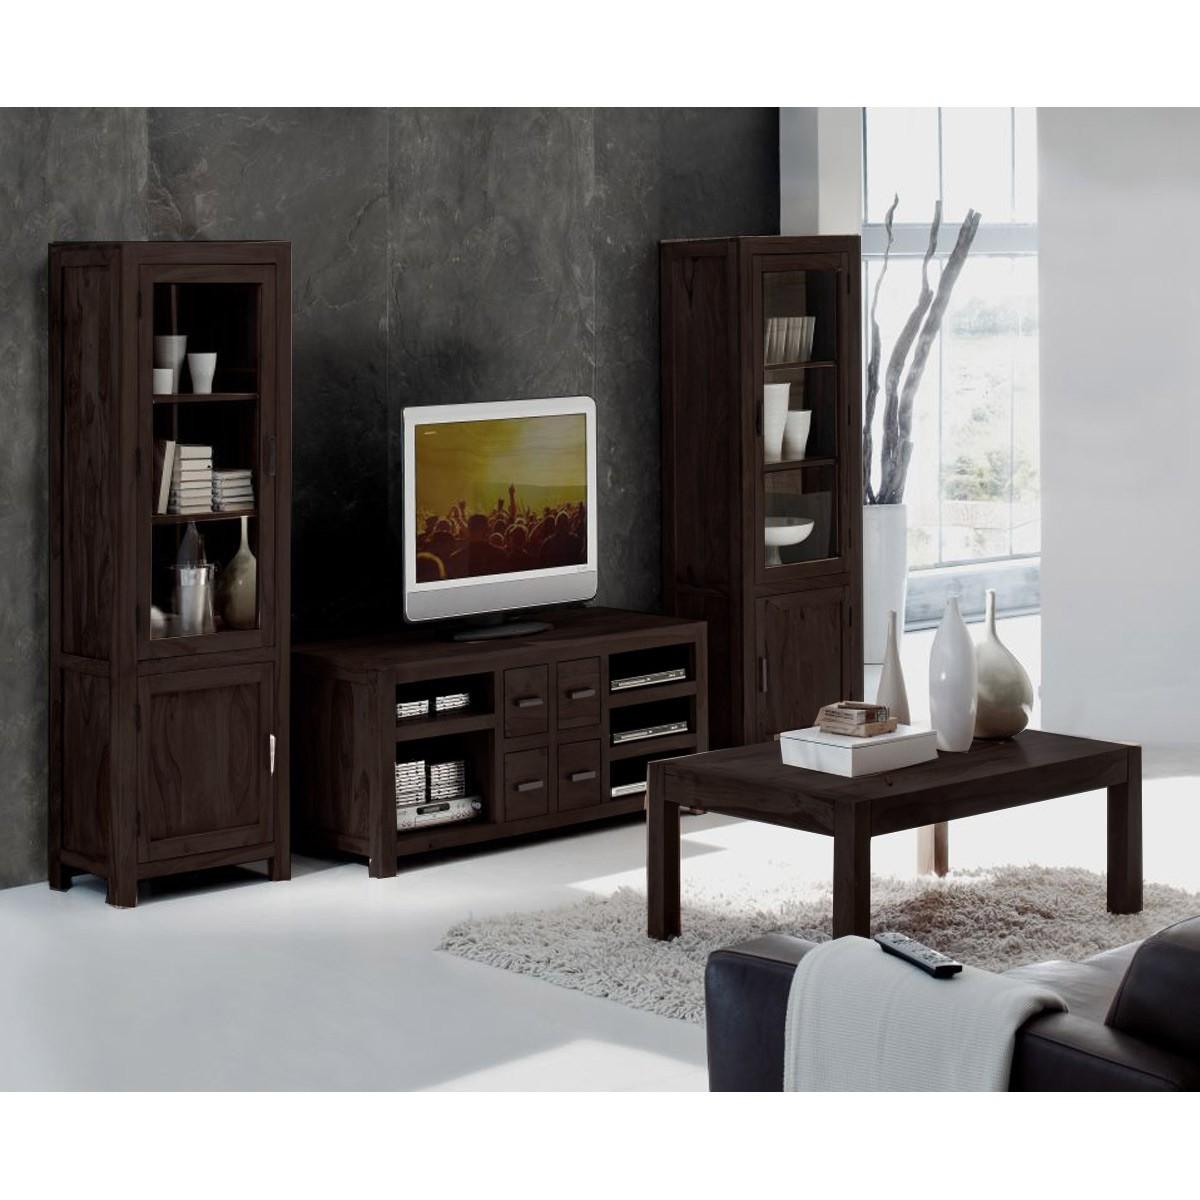 tv phonom bel home immoviva design und luxus f r. Black Bedroom Furniture Sets. Home Design Ideas